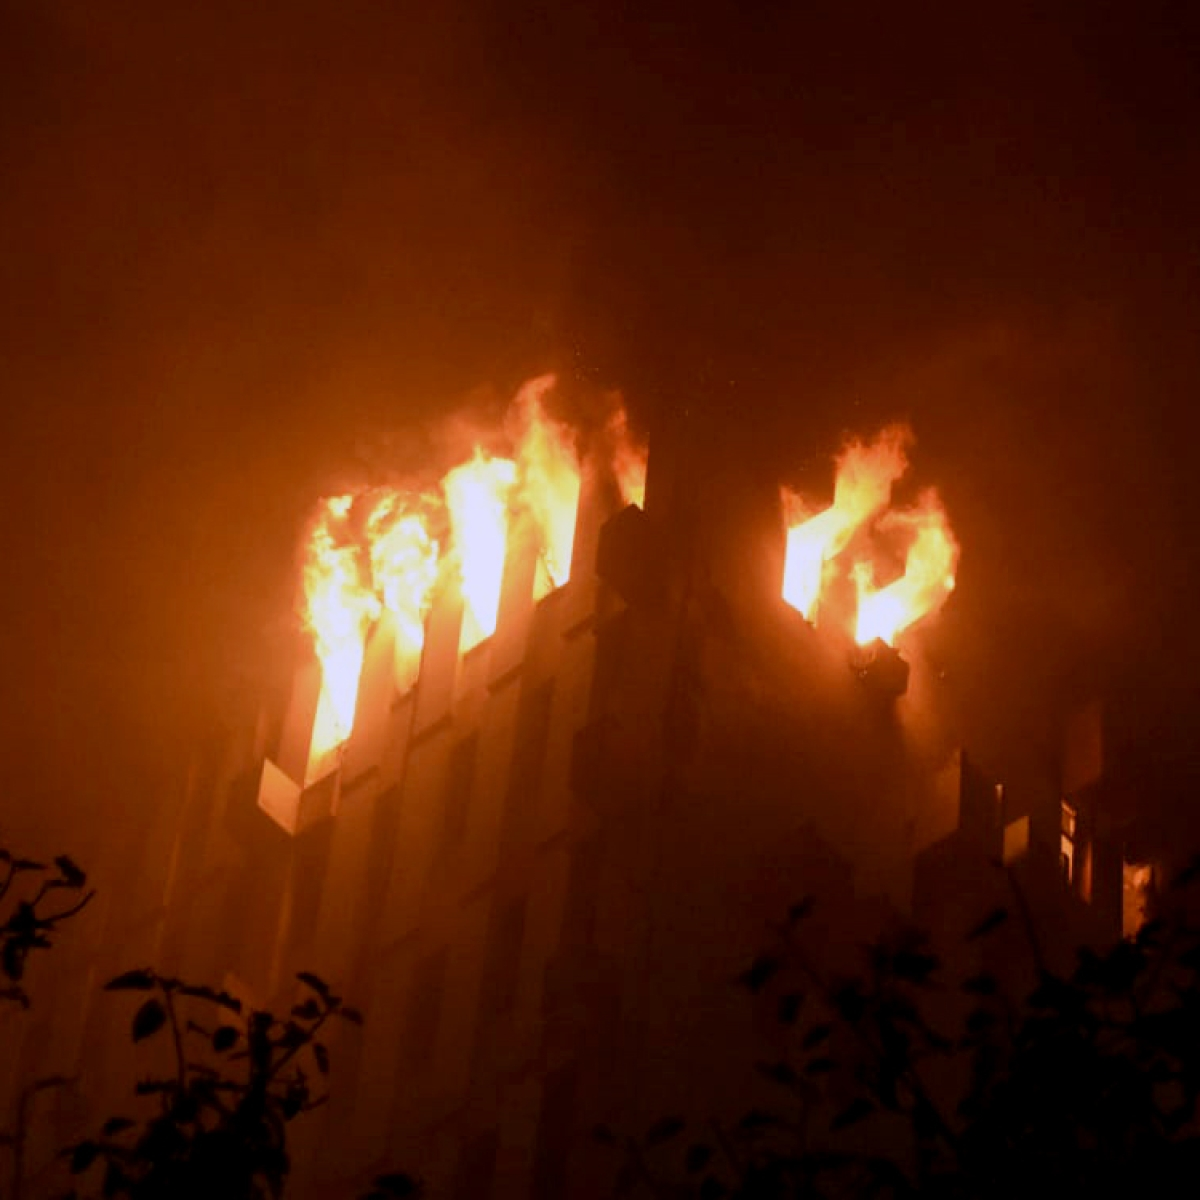 Kolkata: Death toll in Strand Road Eastern Railway building fire rises to 9